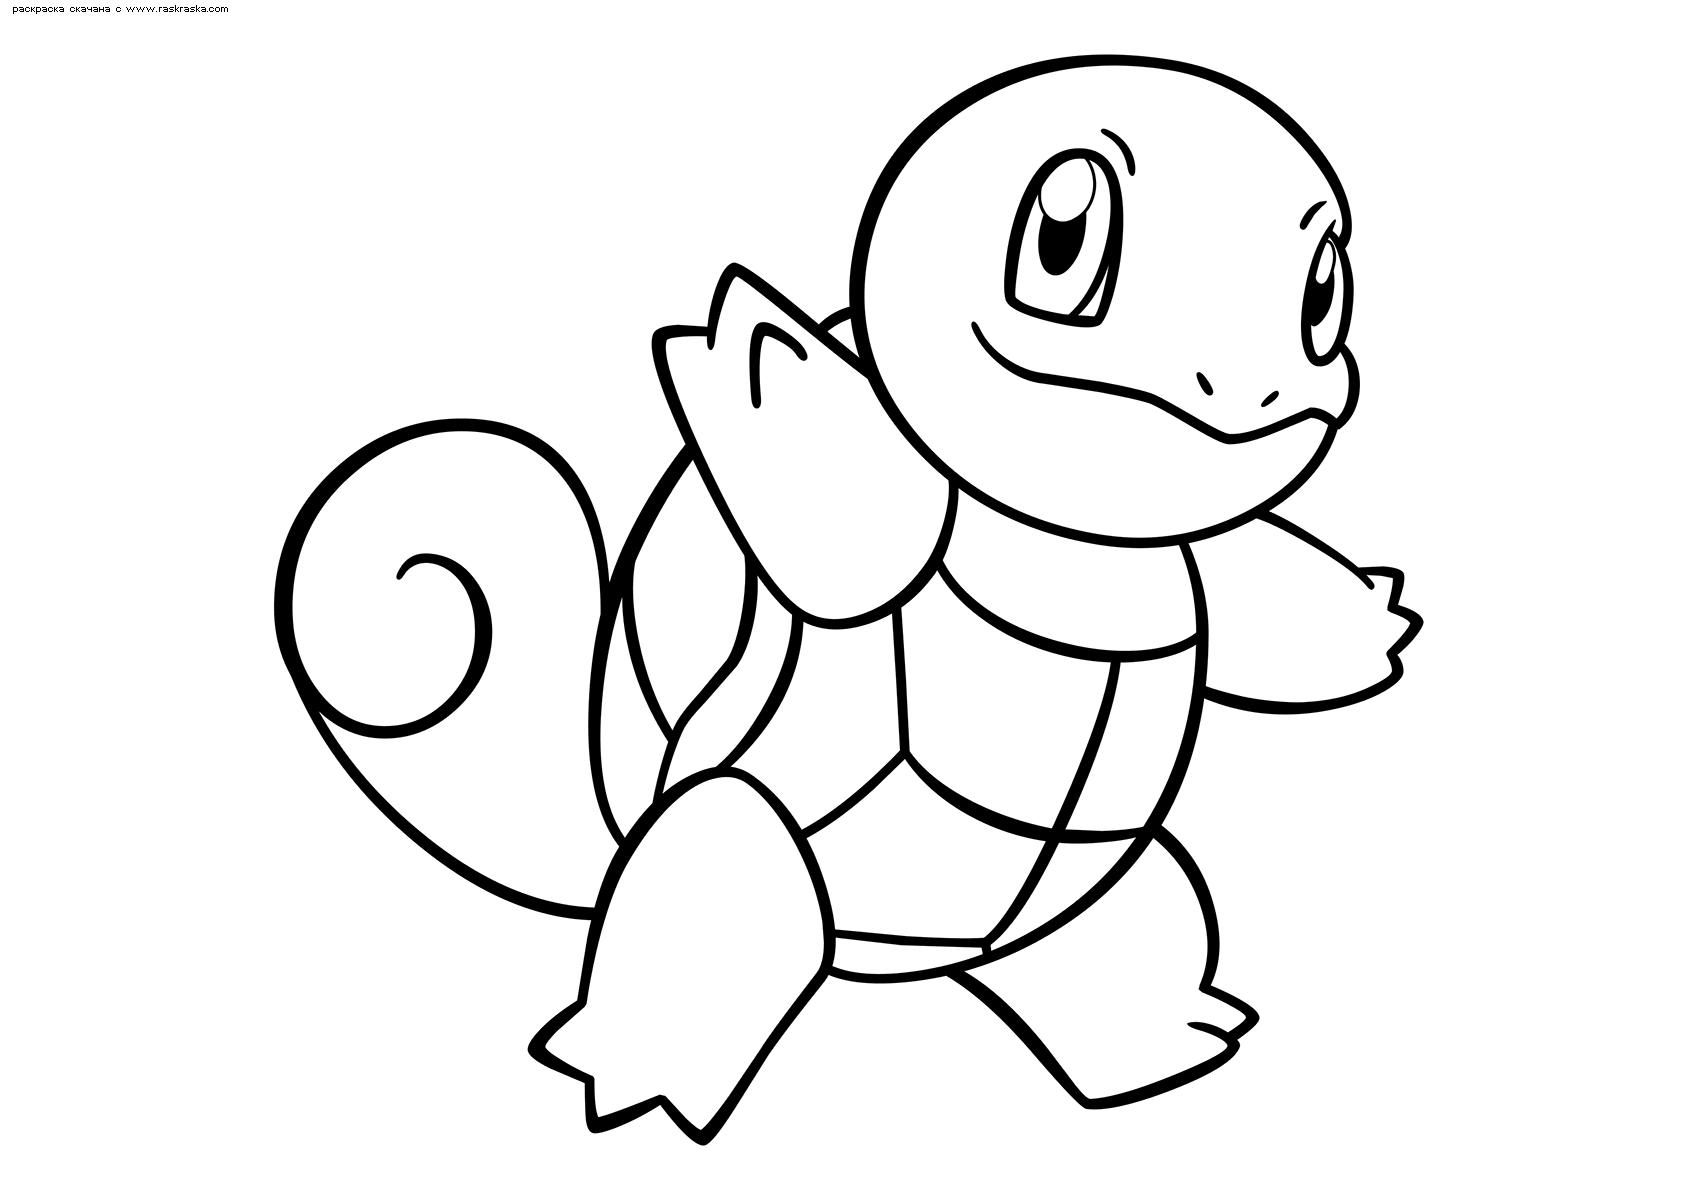 Раскраска Покемон Сквиртл (Squirtle) | Раскраски эволюция ...